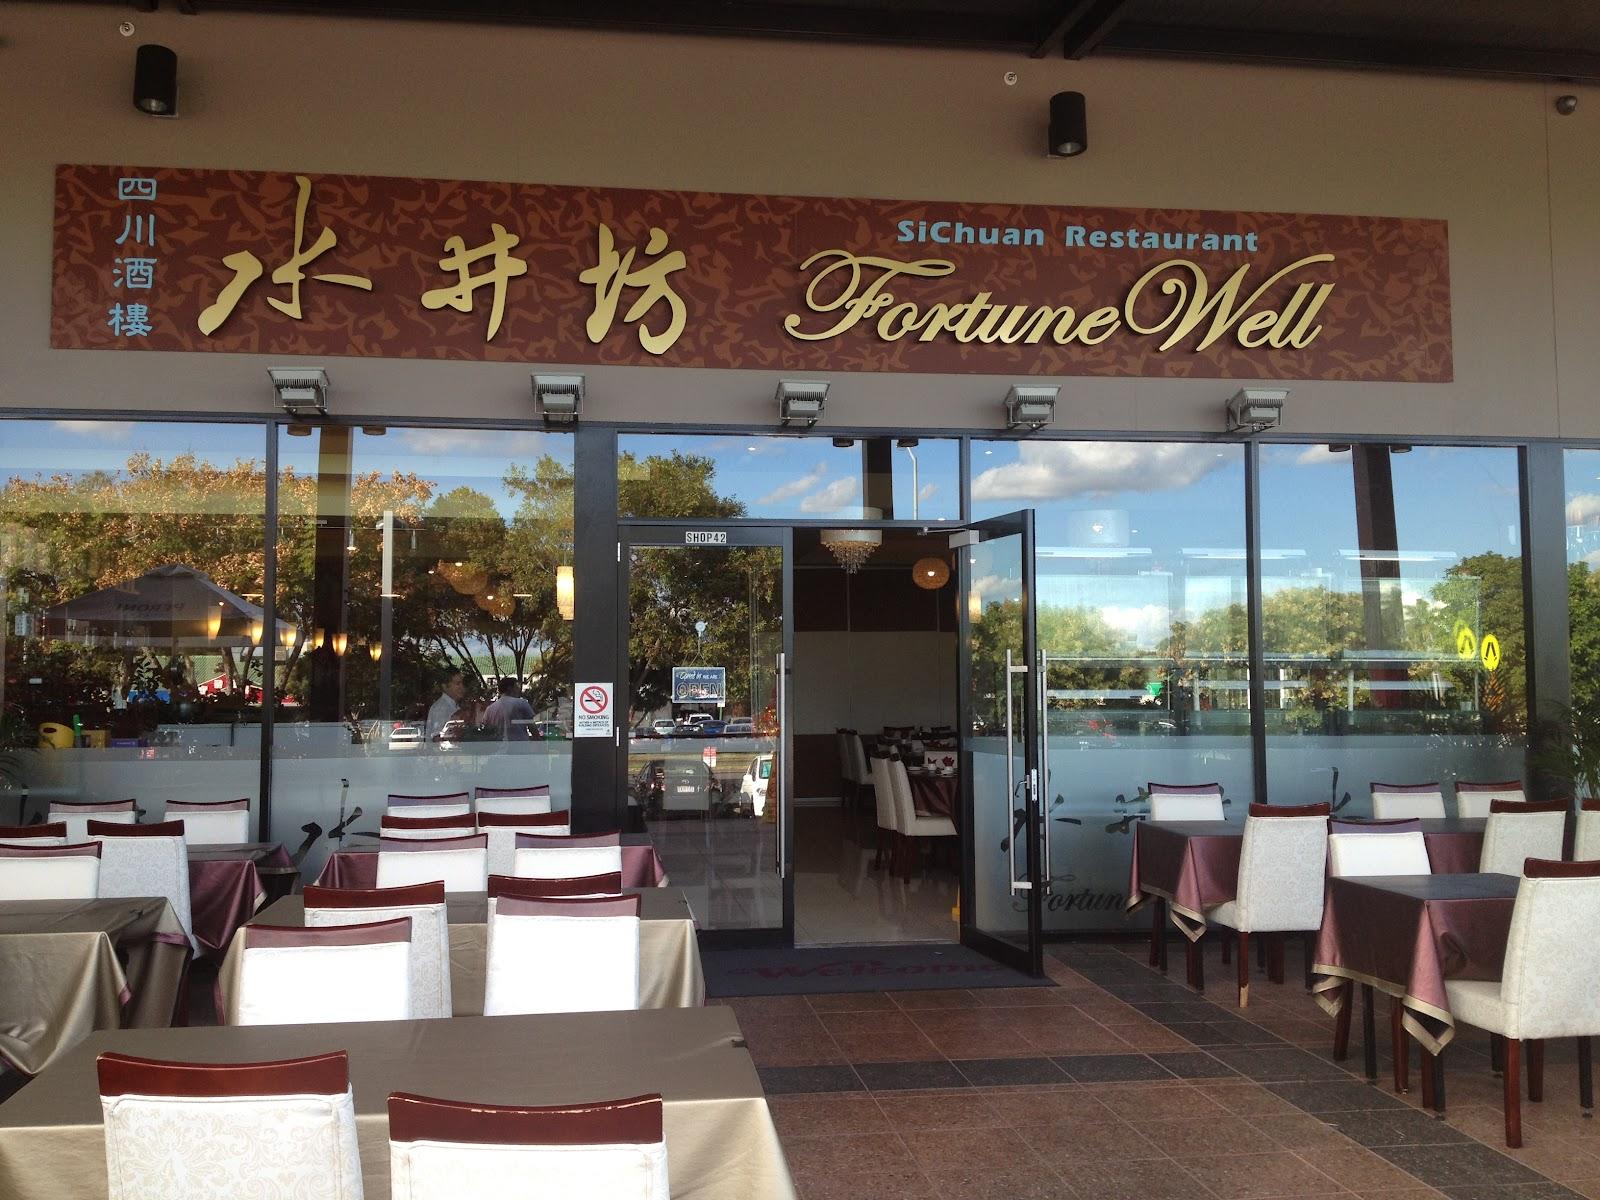 Fortune Well SiChuan Restaurant | strawbeari3